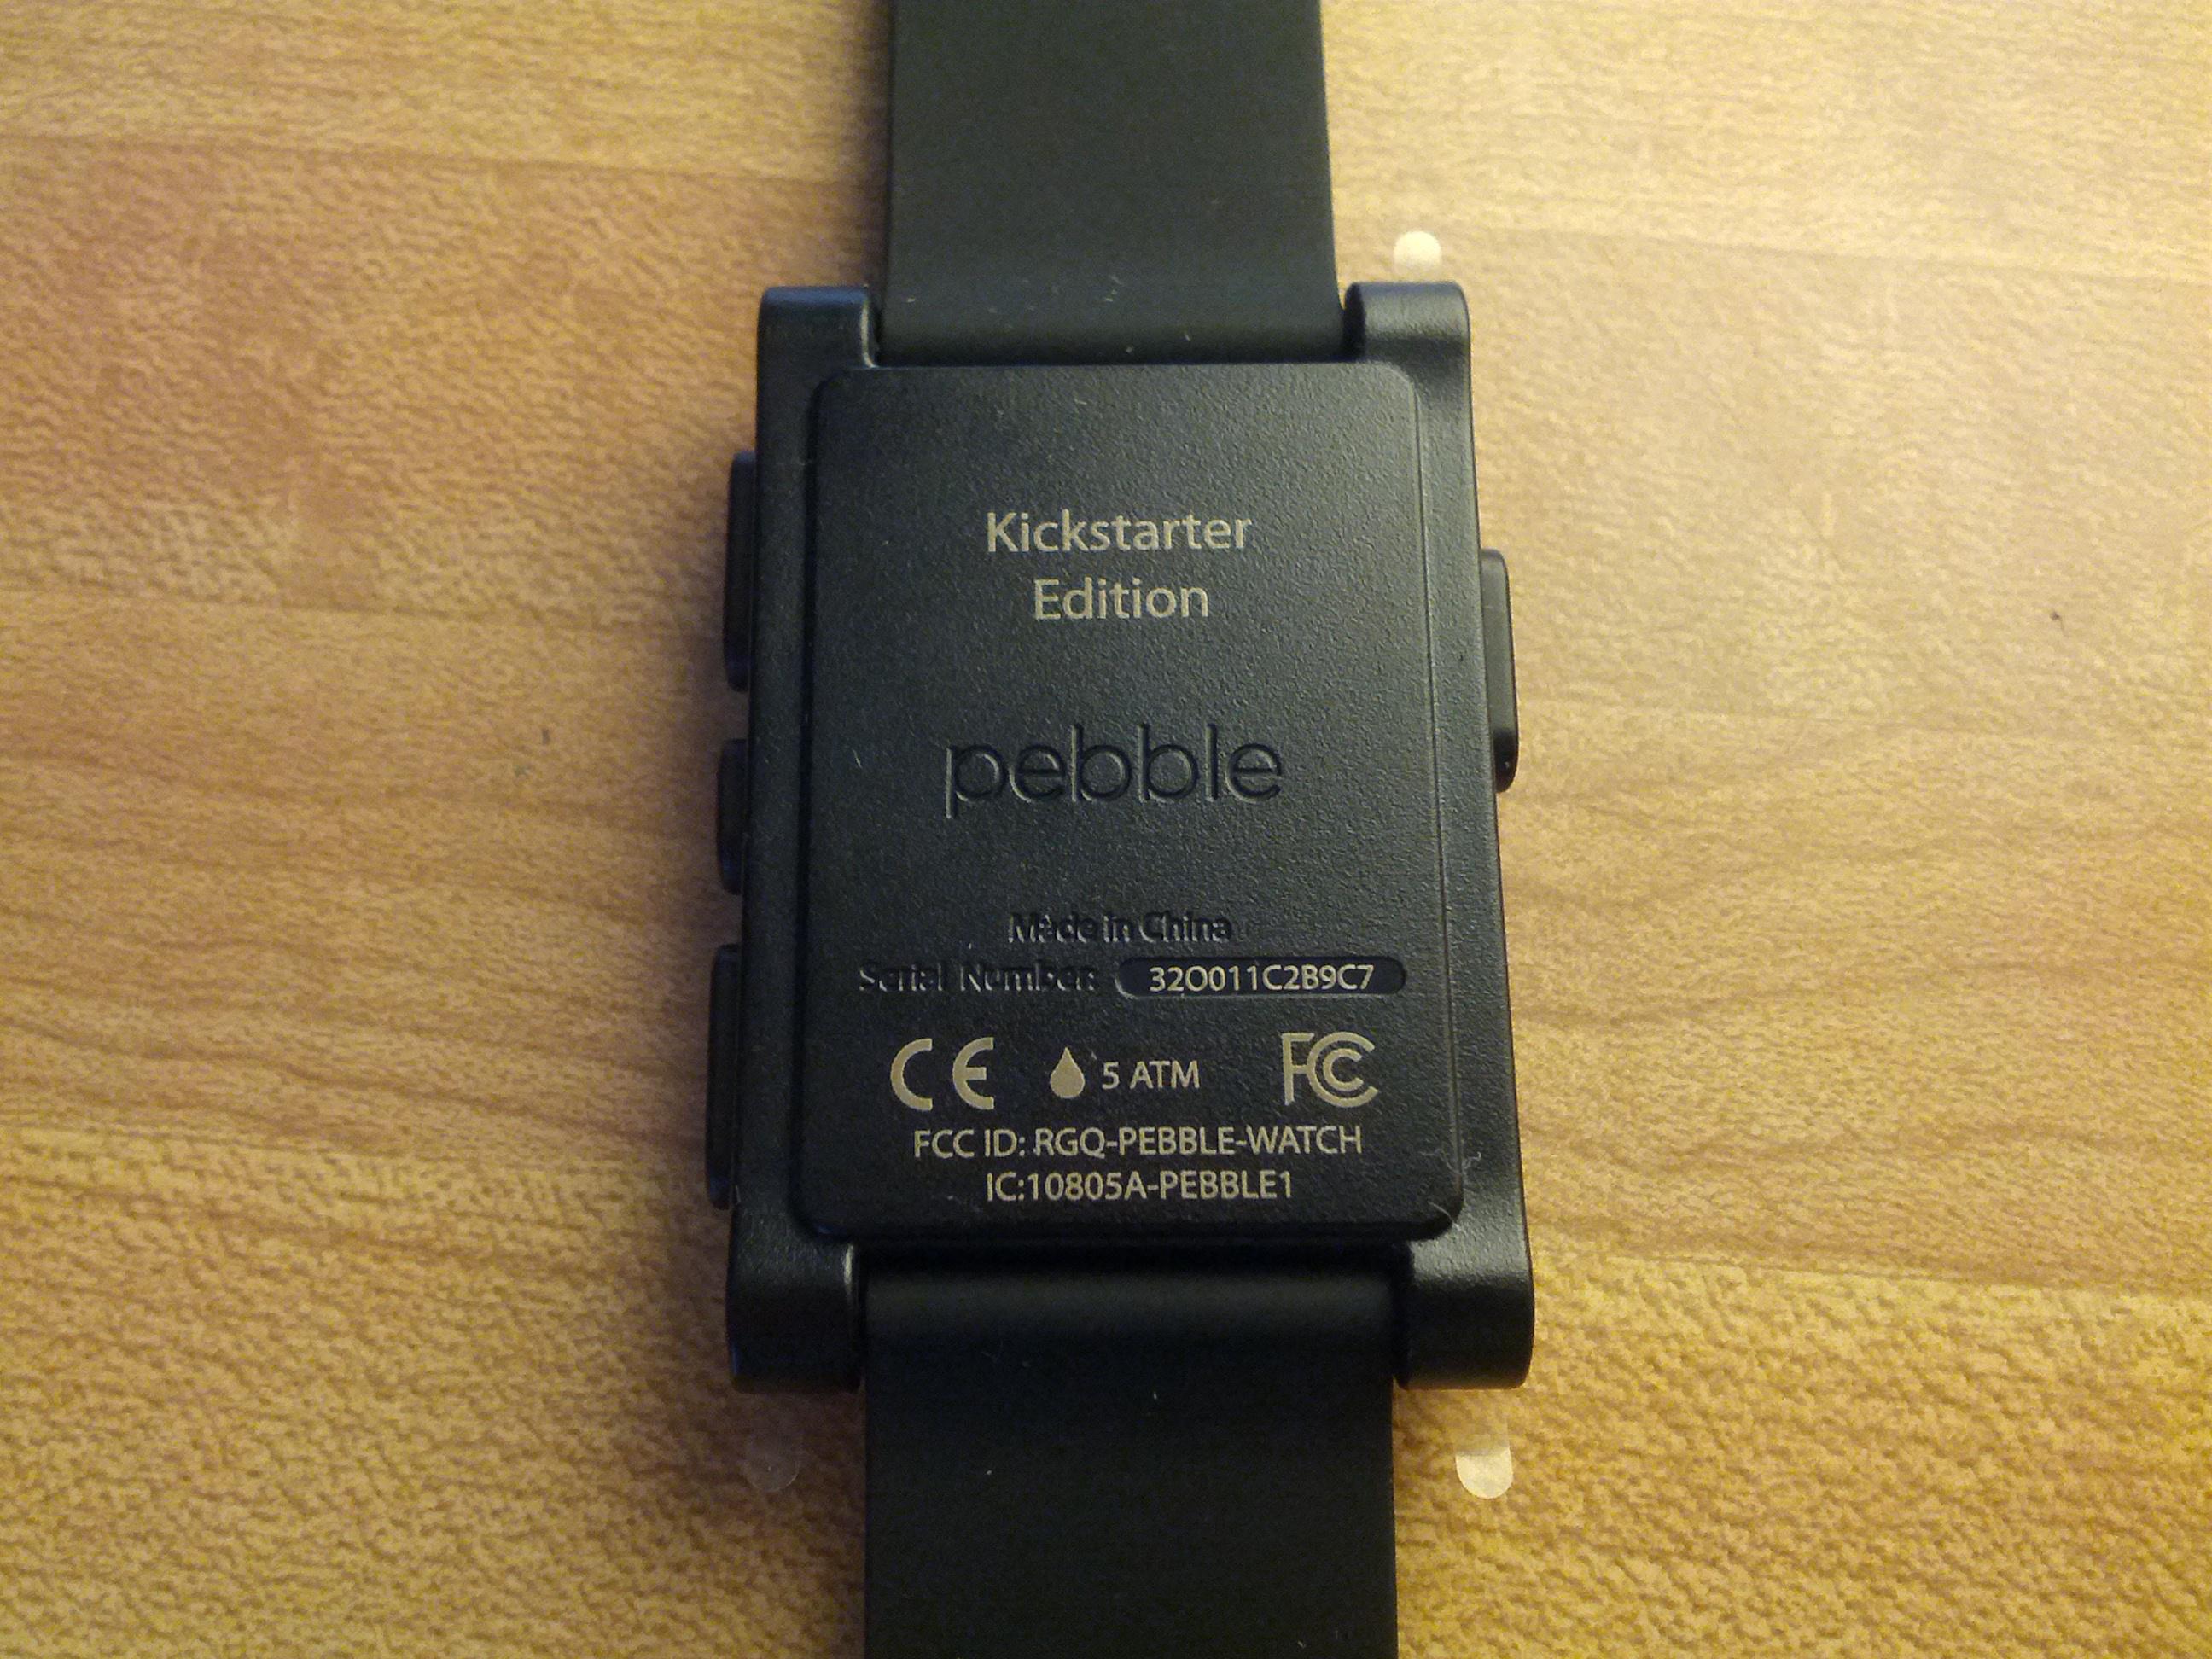 "Because I backed Pebble on Kickstarter, my watch has ""Kickstarter Edition"" written on the back."